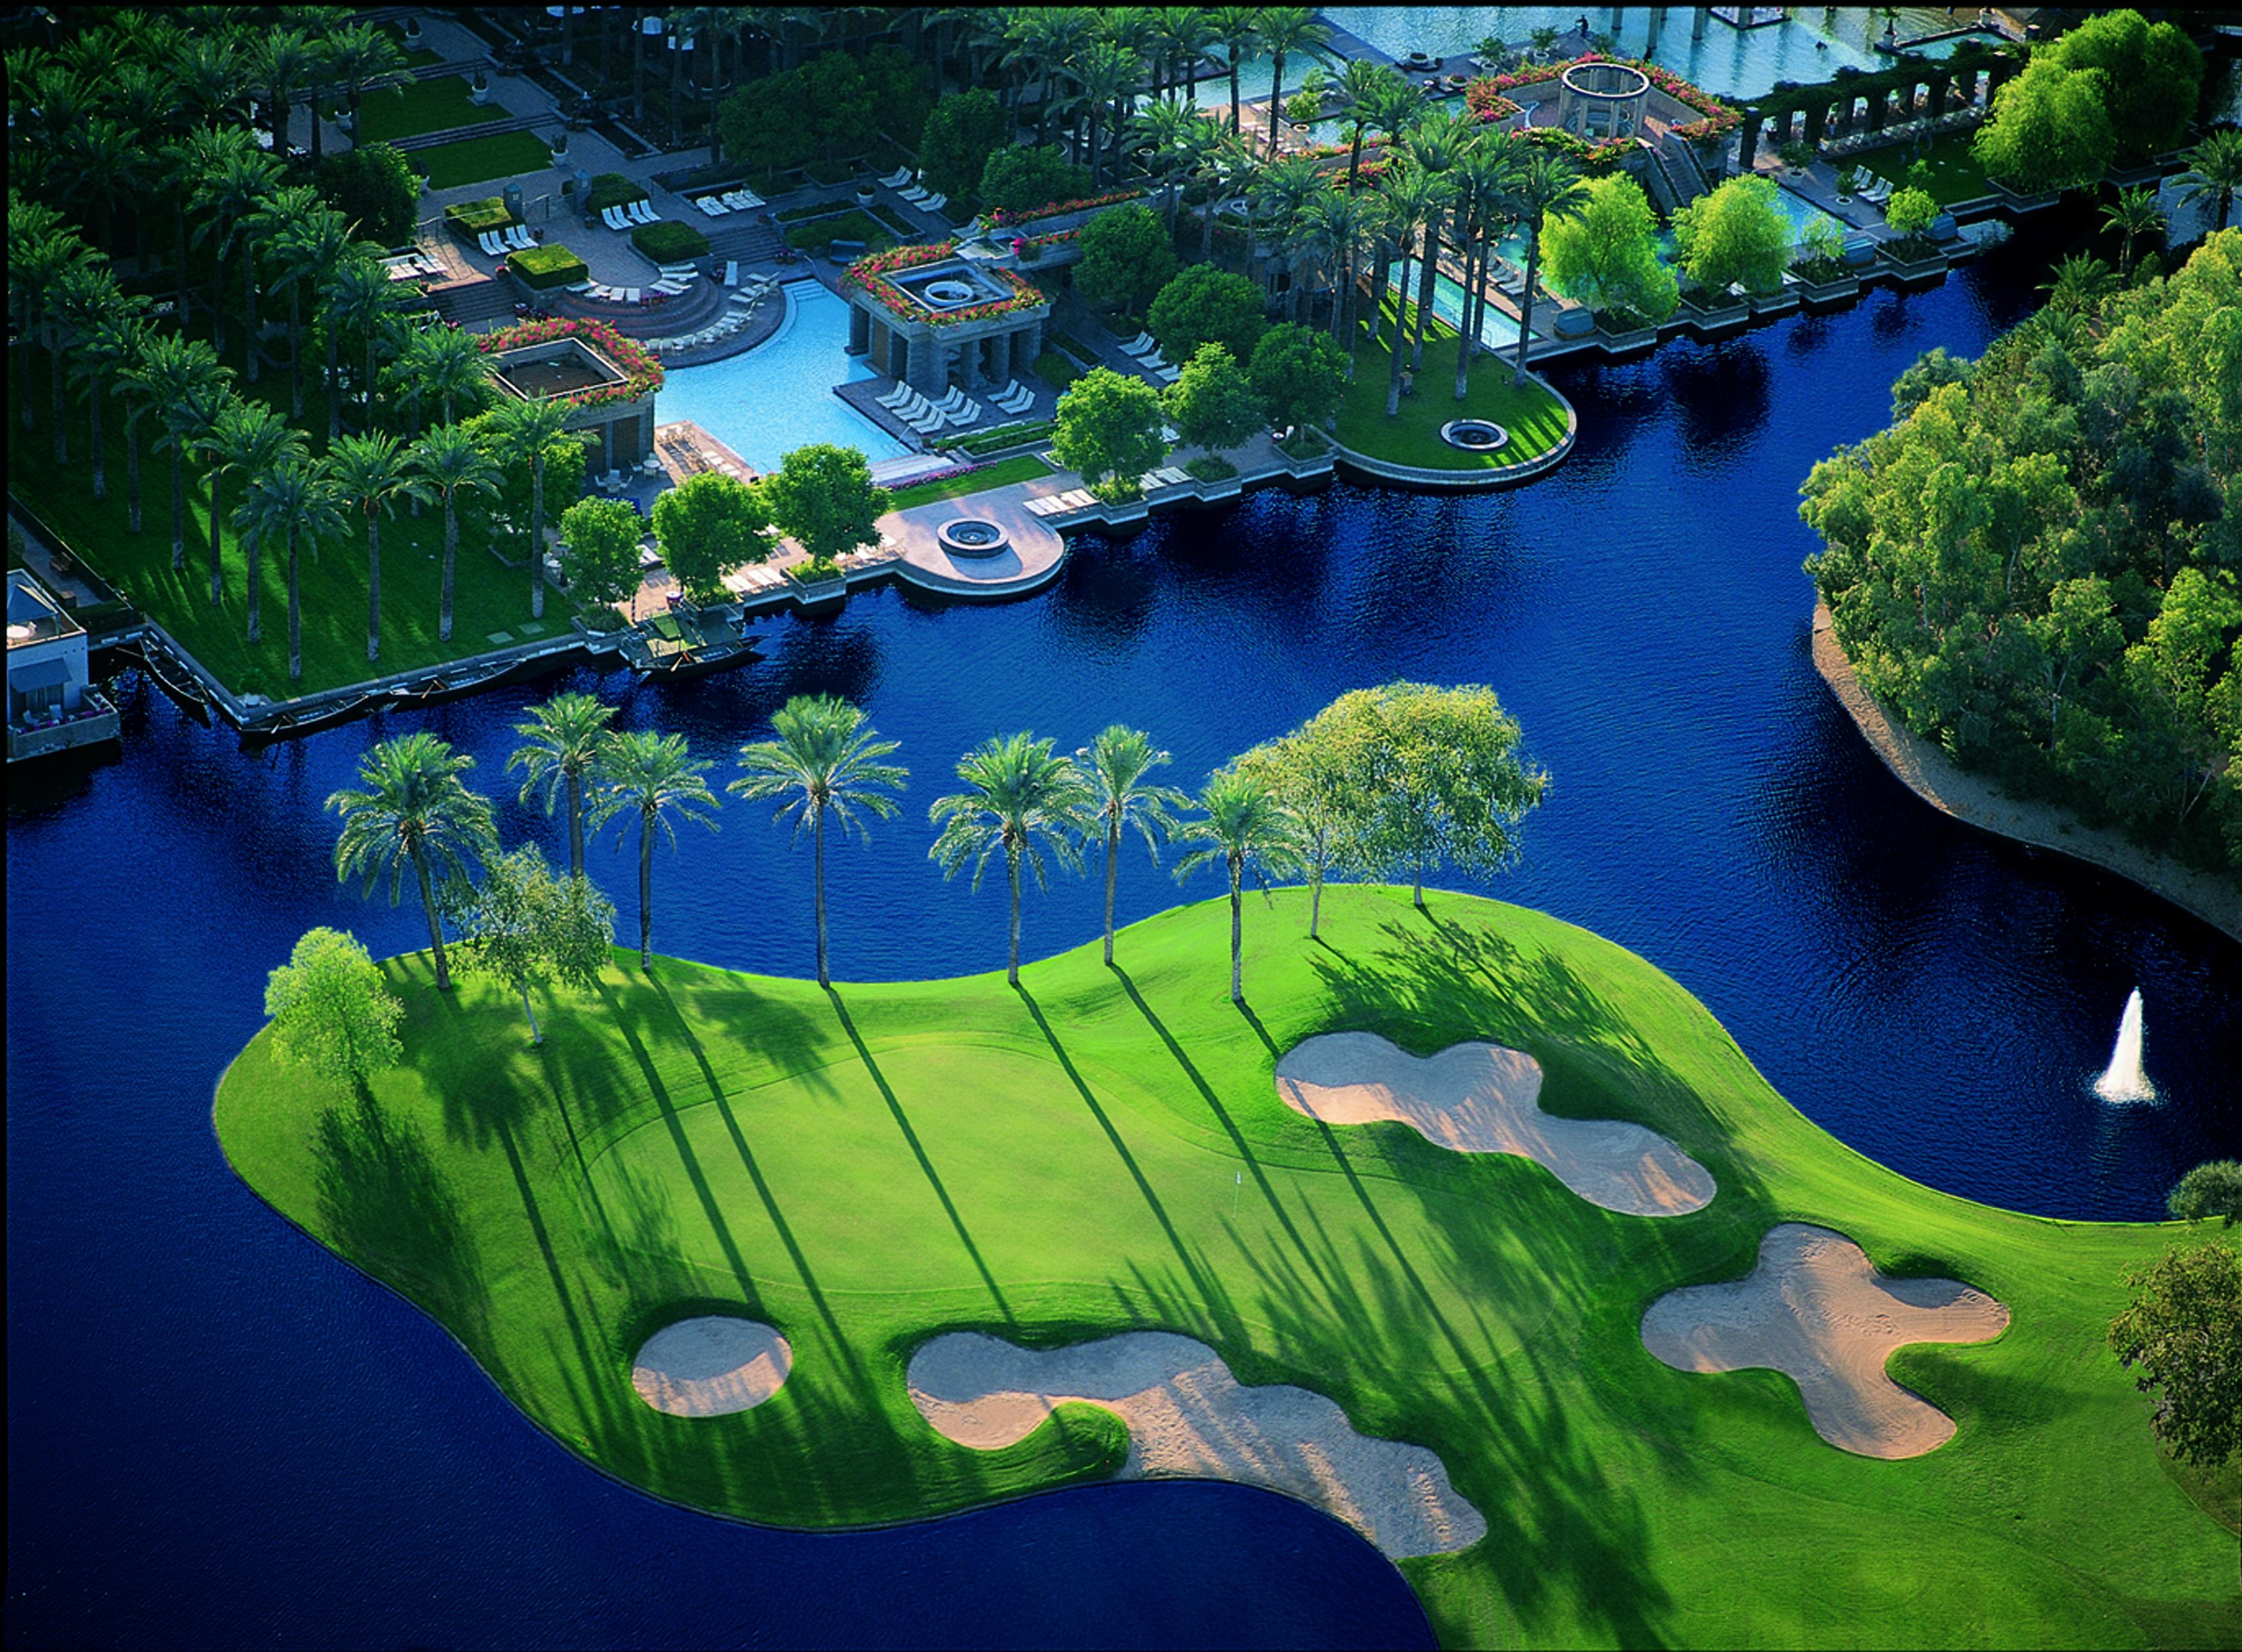 3 Favorite Golf Getaways for the Spring